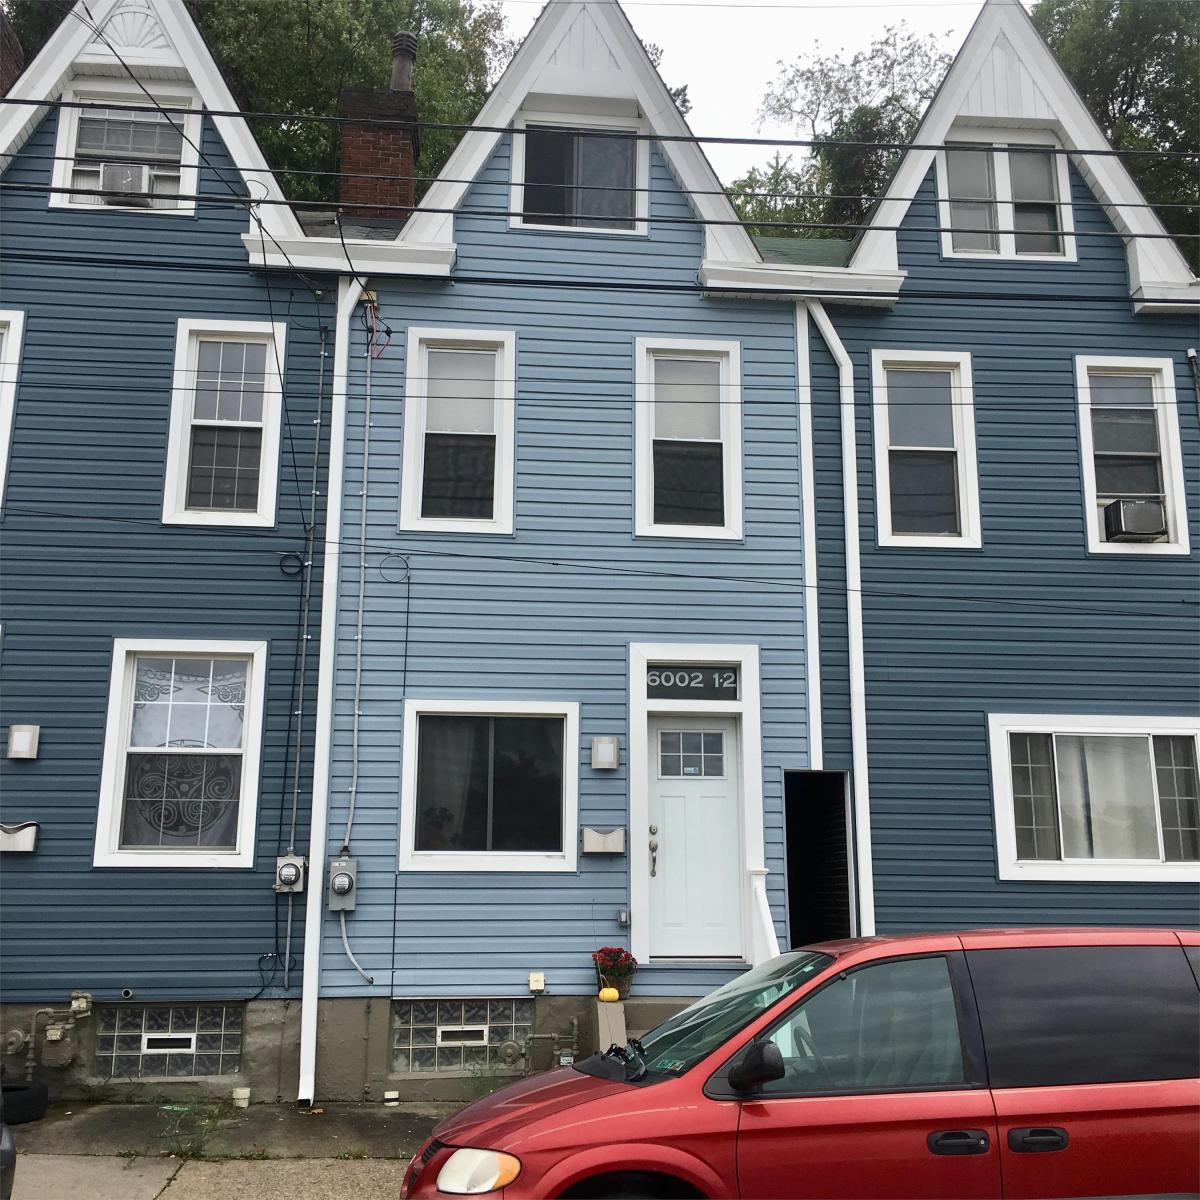 6002 1/2 Butler Street, Pittsburgh, PA 15201 | HotPads